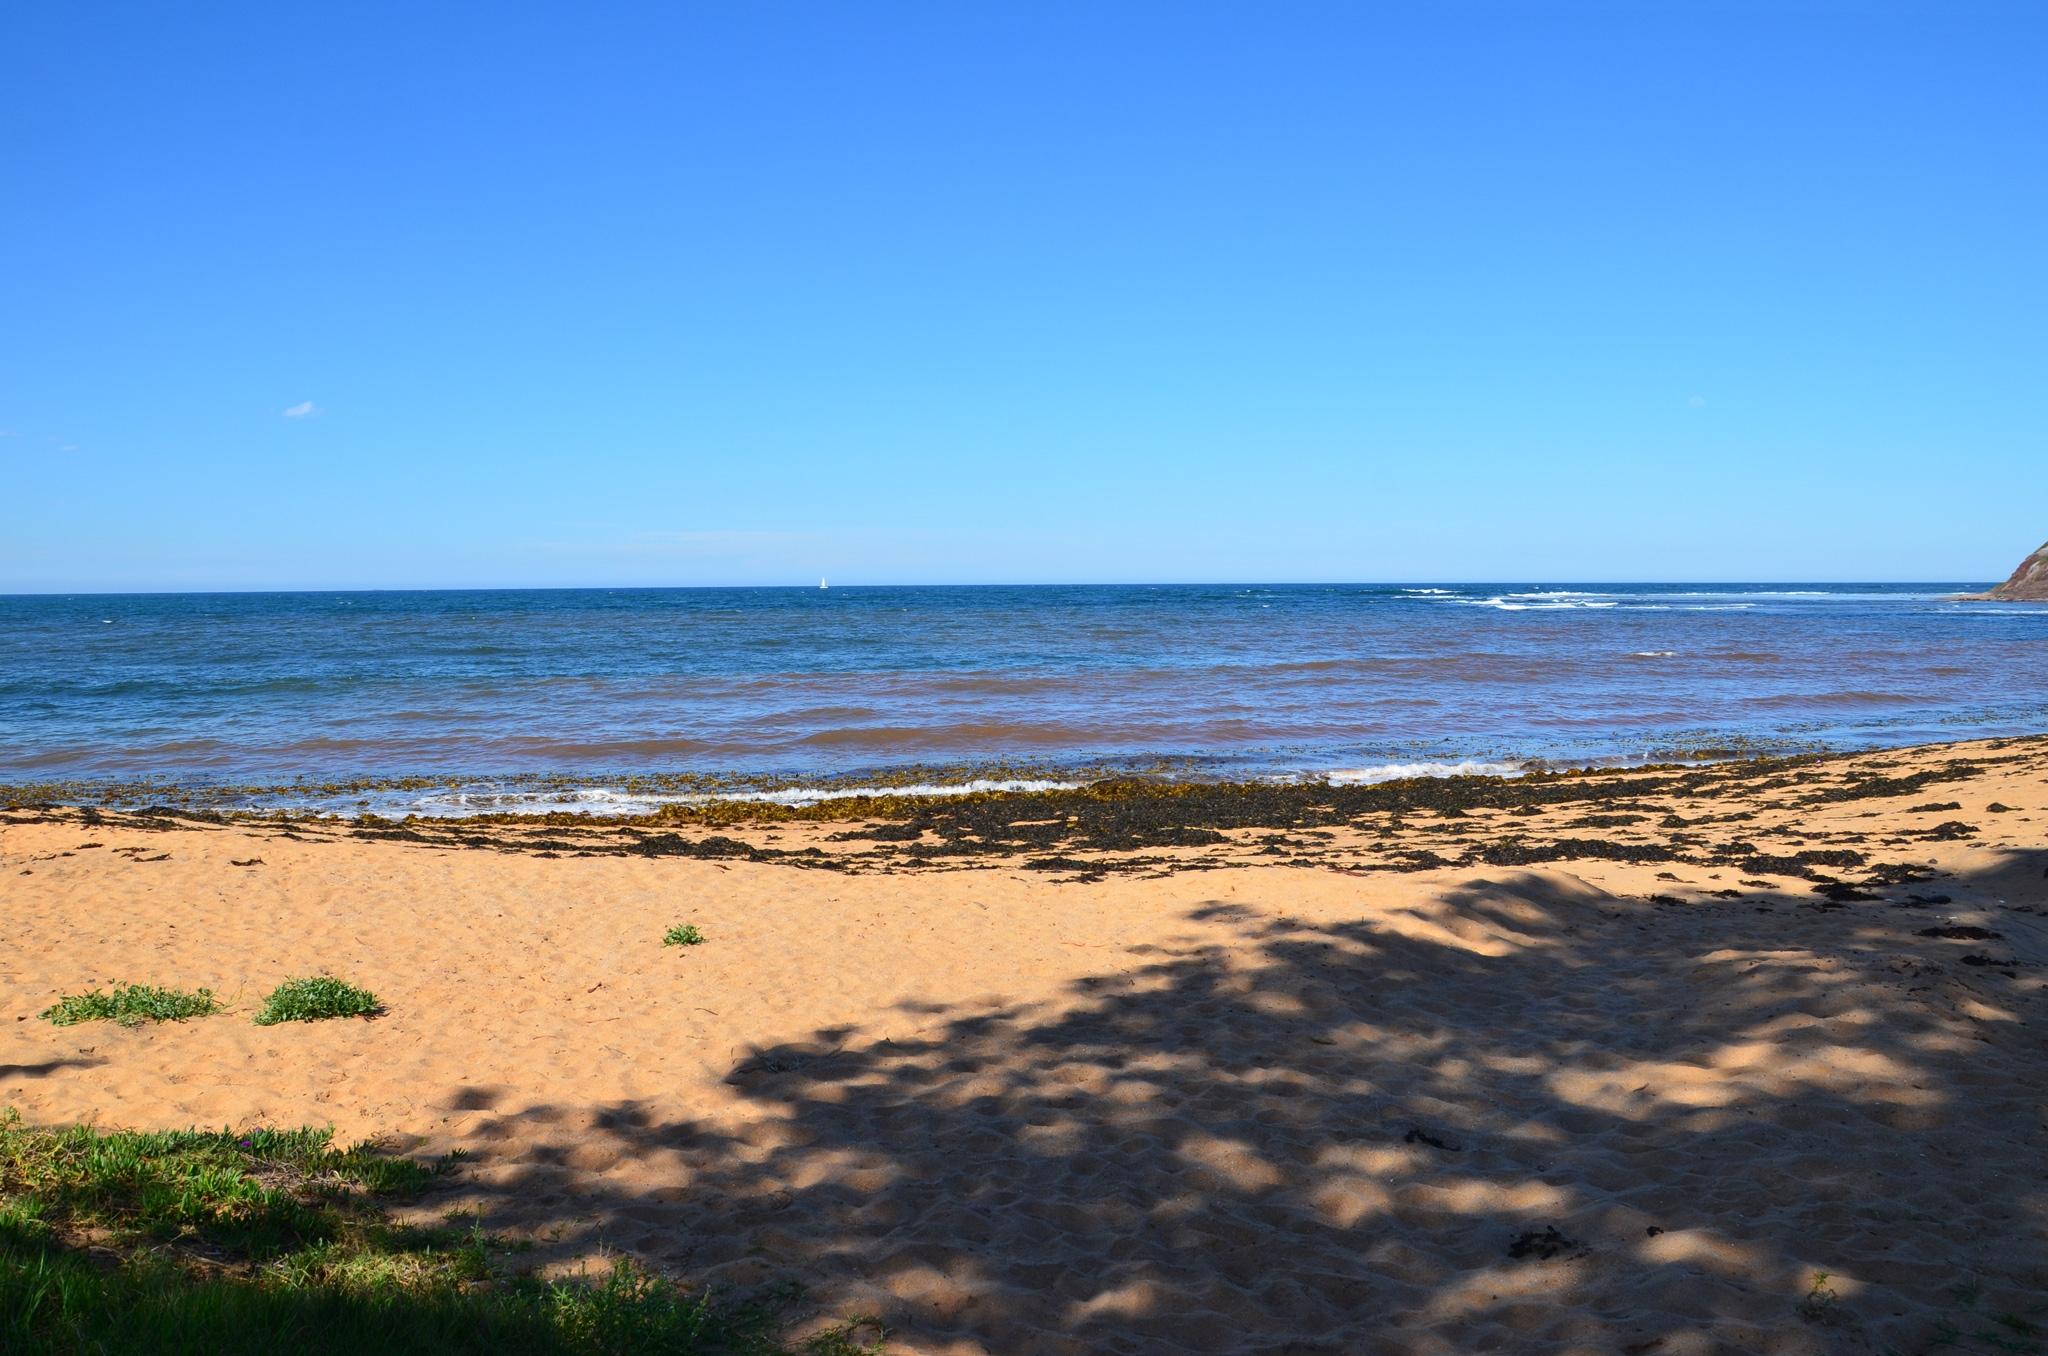 Long Reef - Image ©2014 ManlyAustralia.com